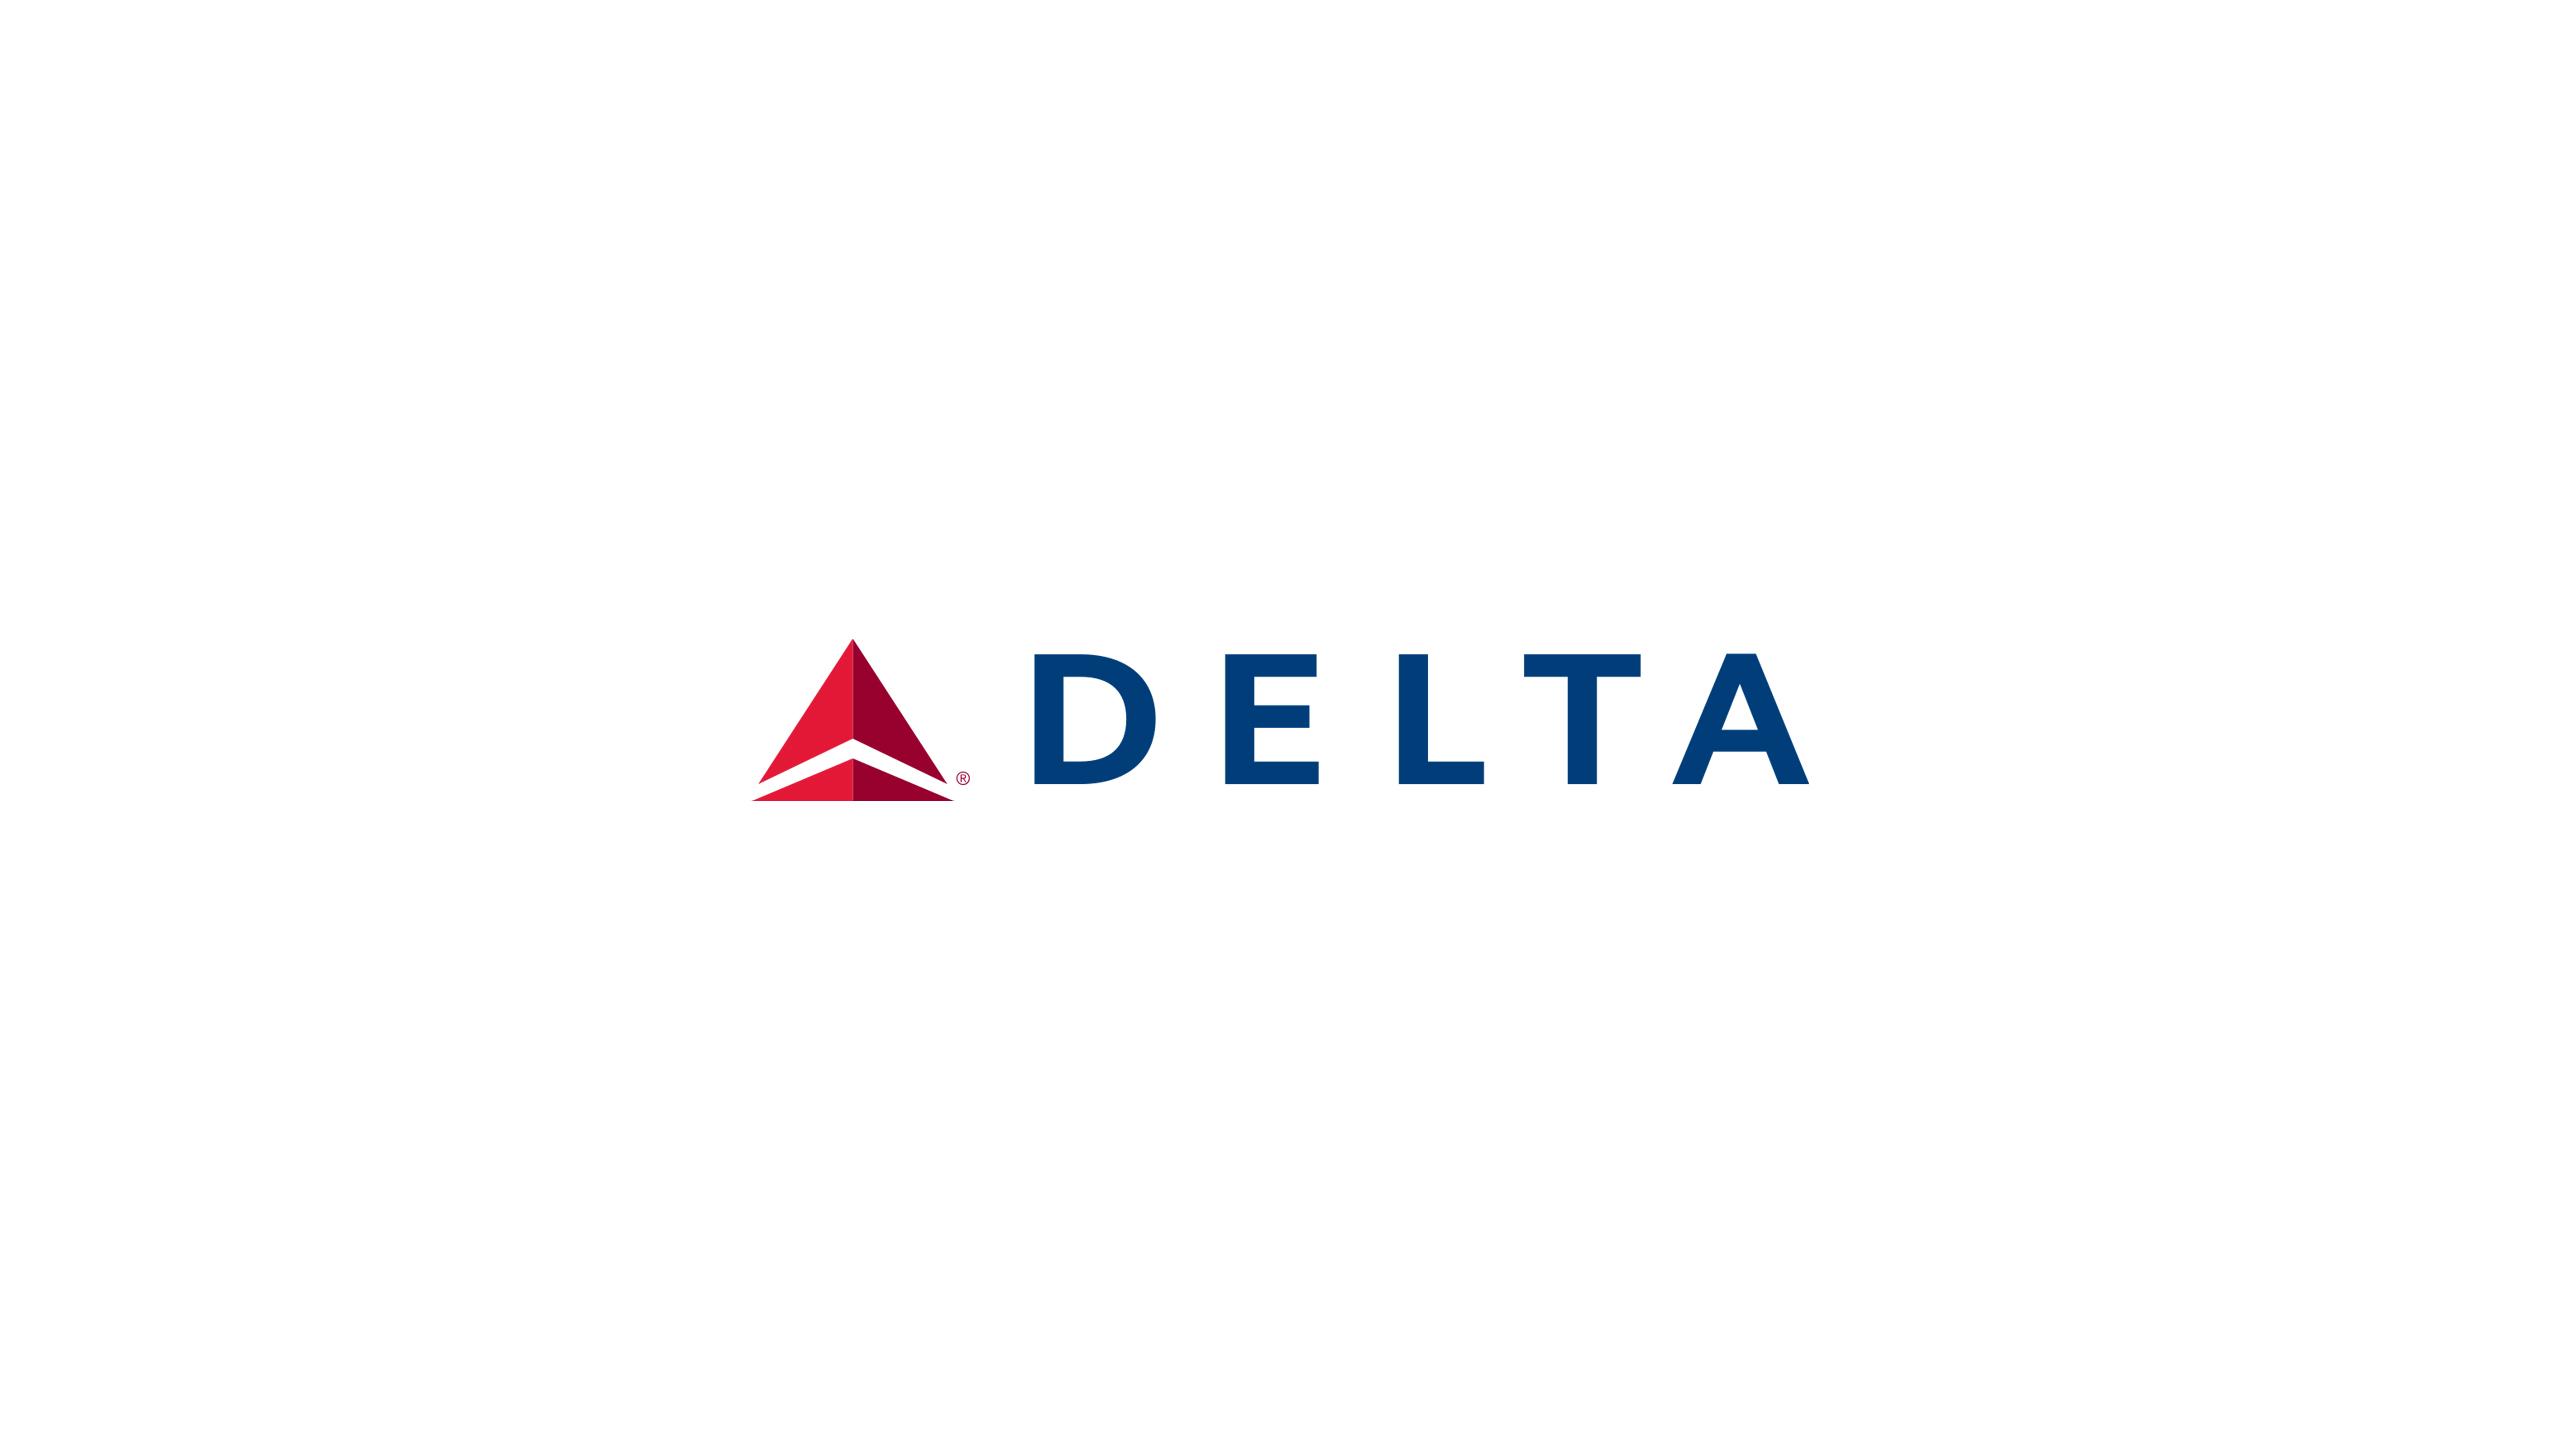 Delta One® Suites 2020 TV Commercial Job List Casting